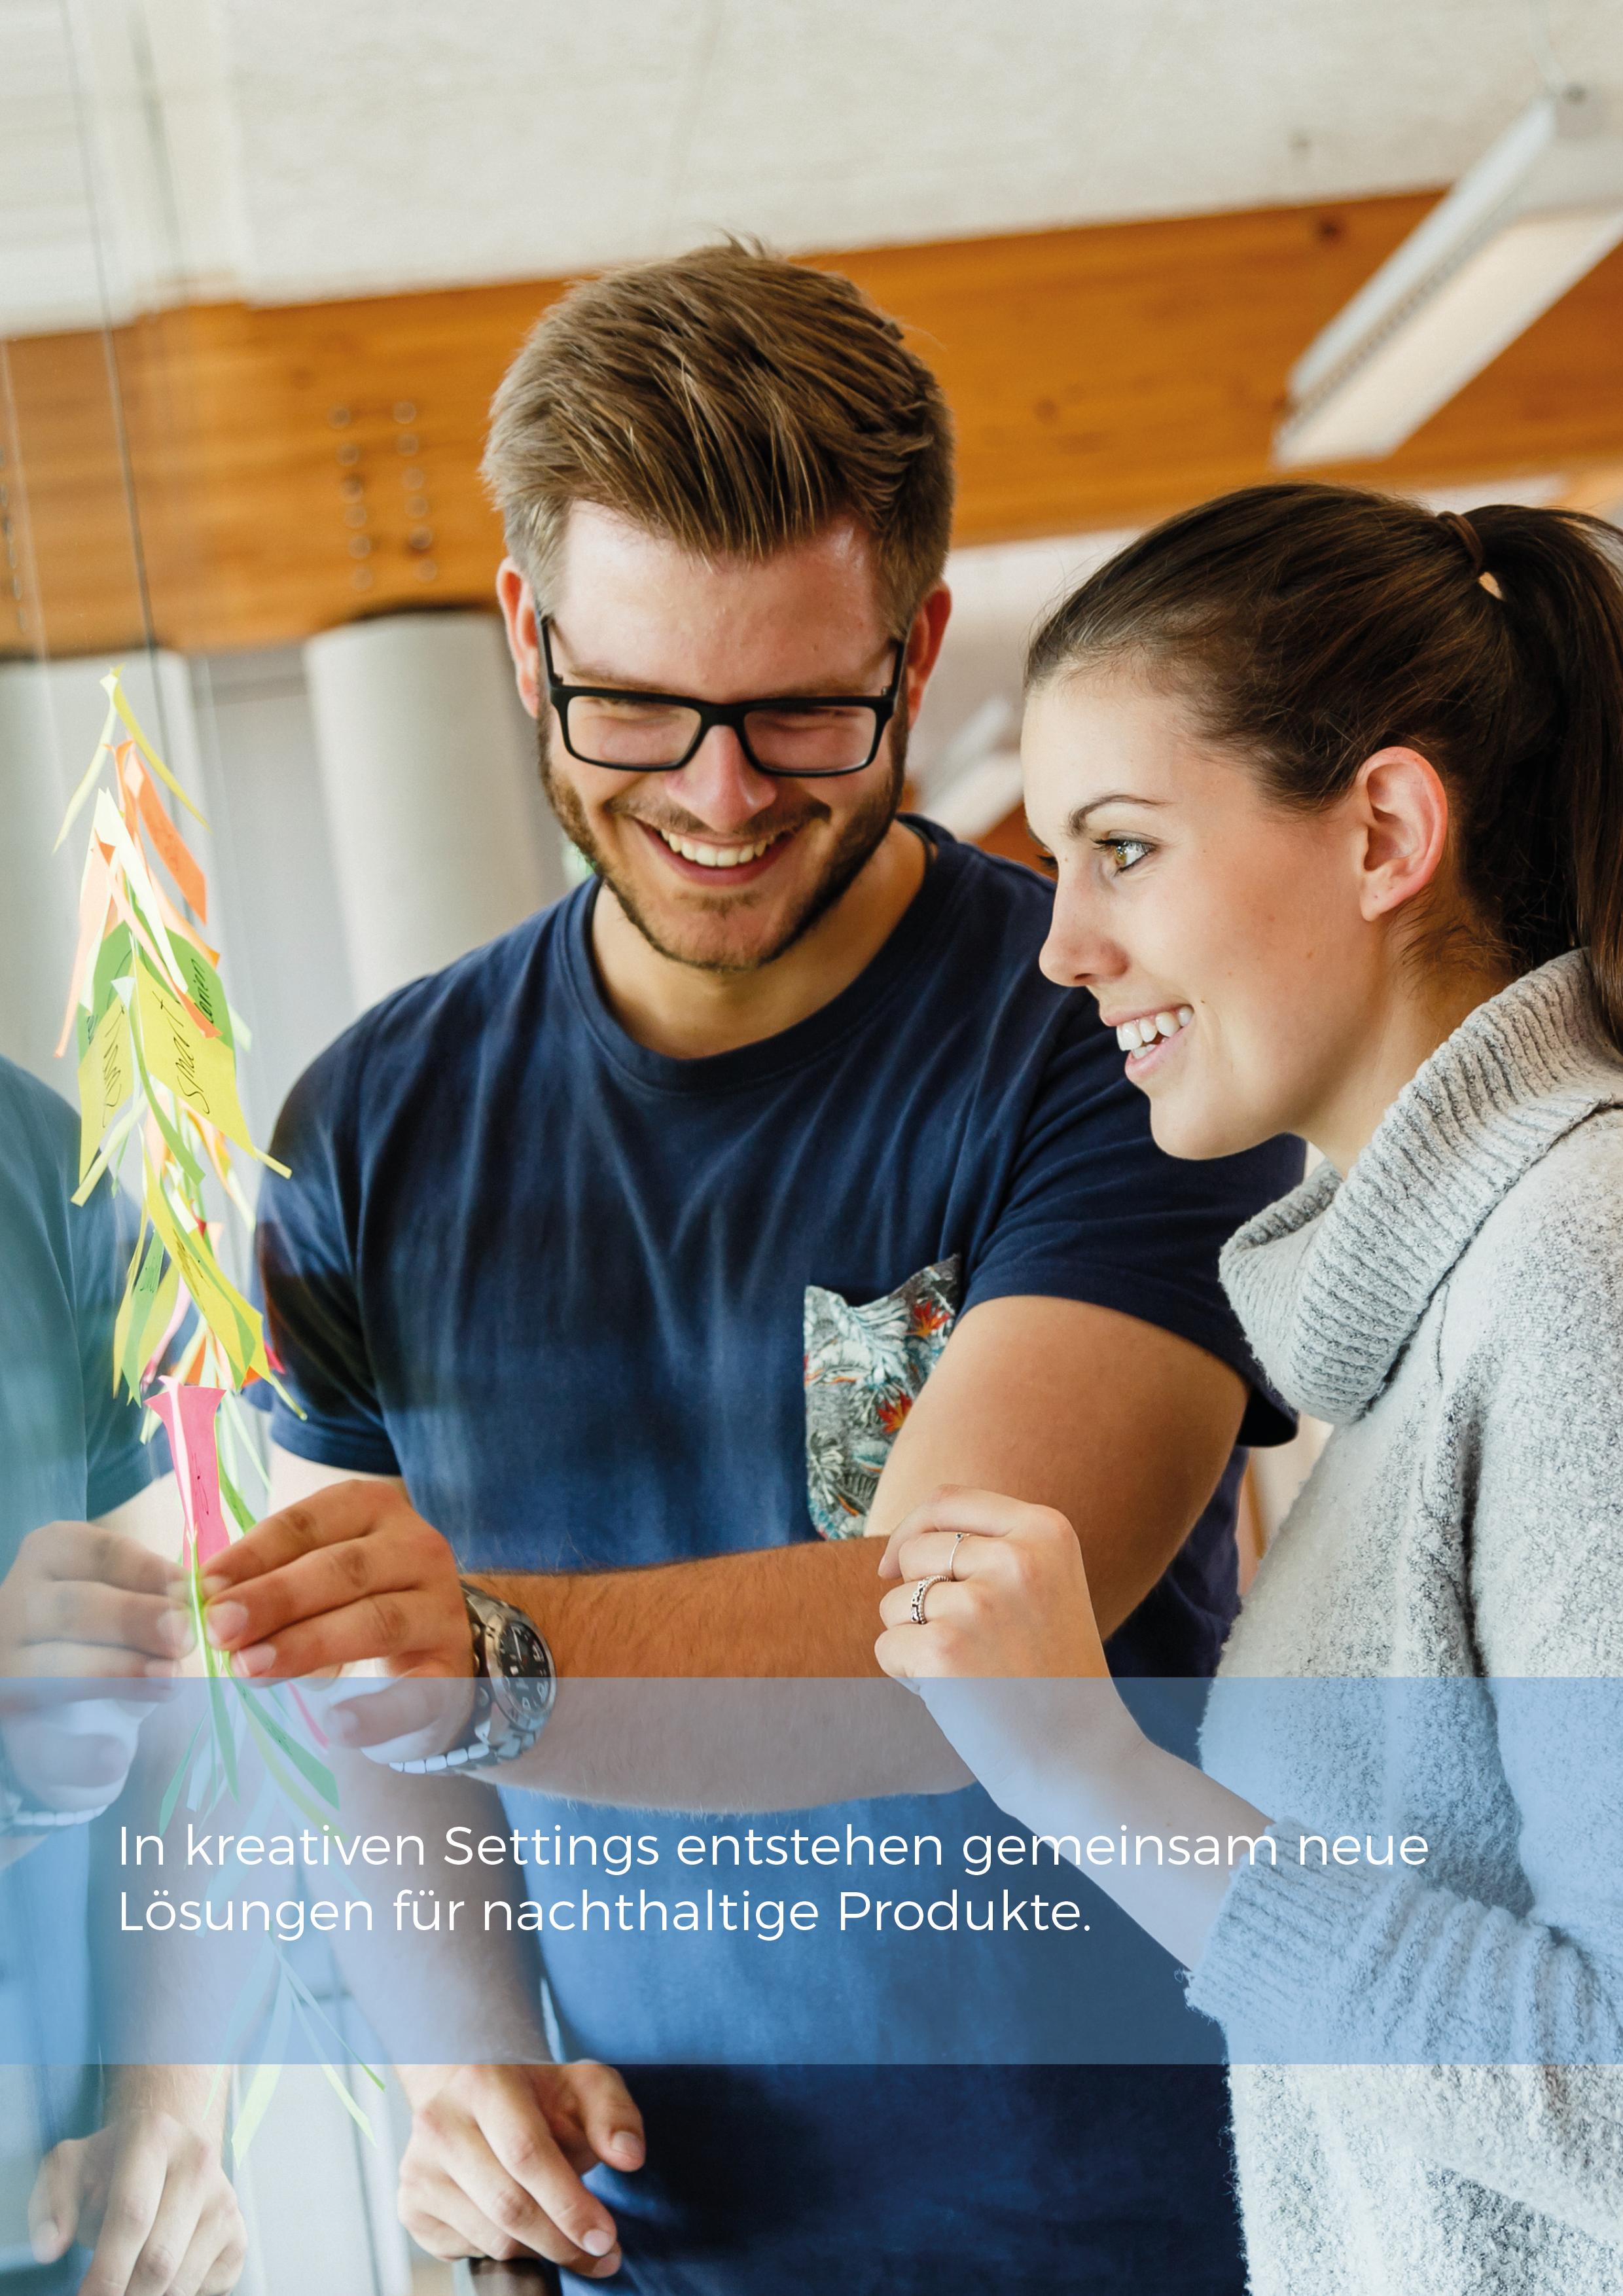 FH Wien – Eco-Design in Gruppenarbeit